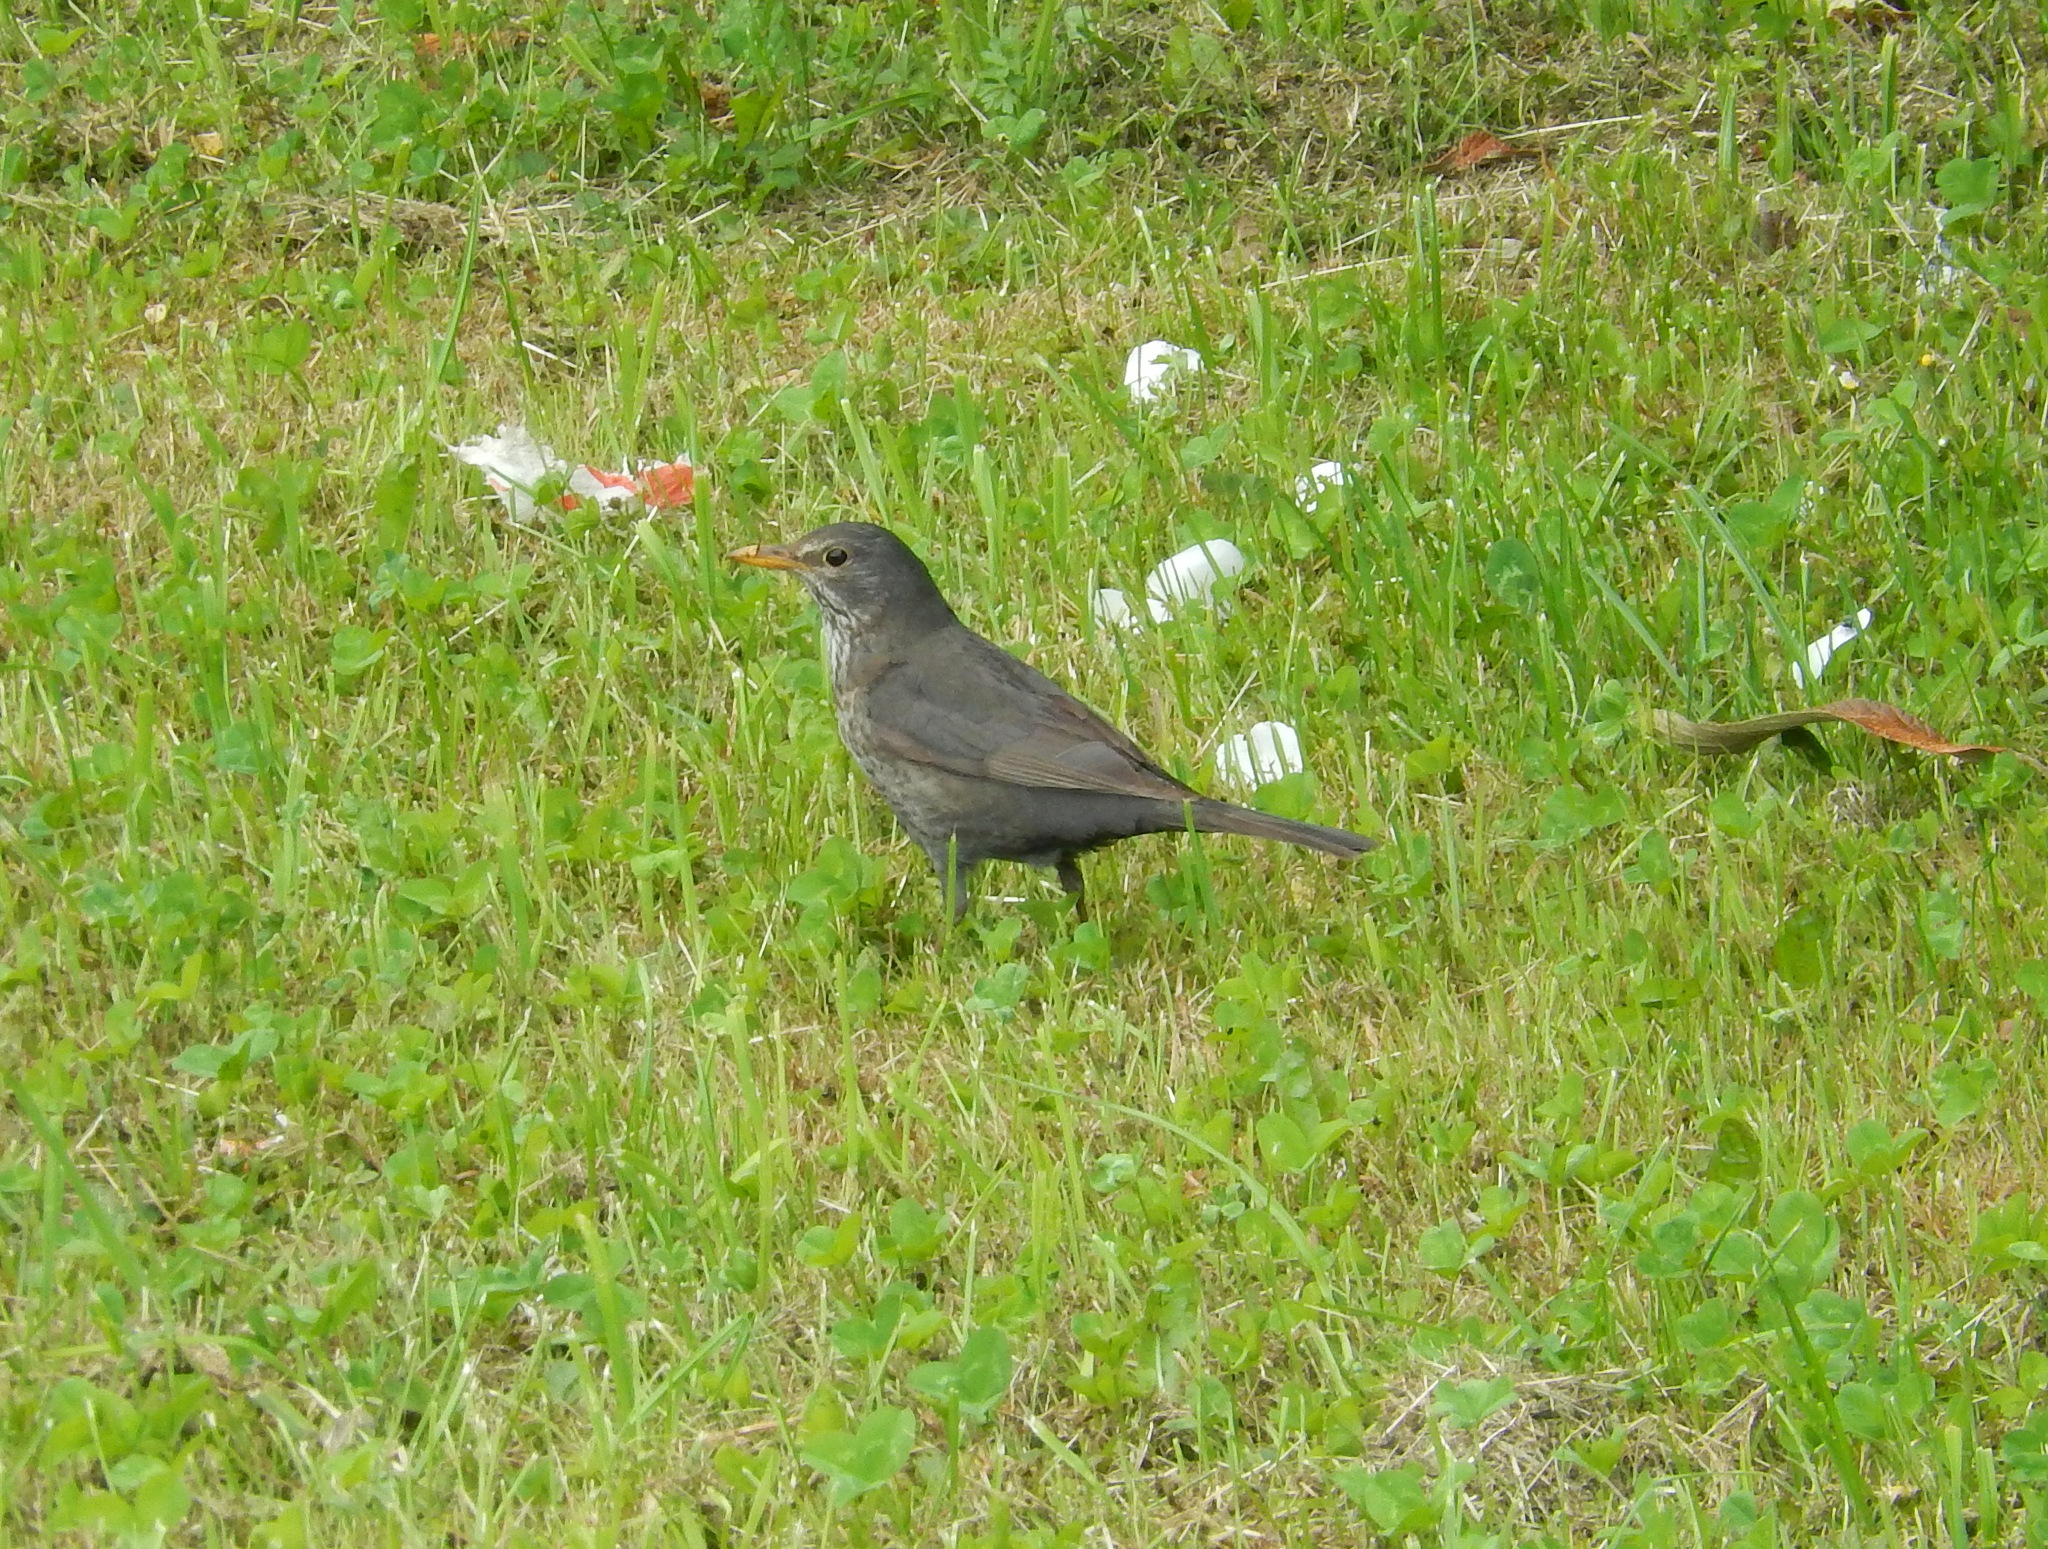 common blackbird (Turdus merula) by zvnktomasevic